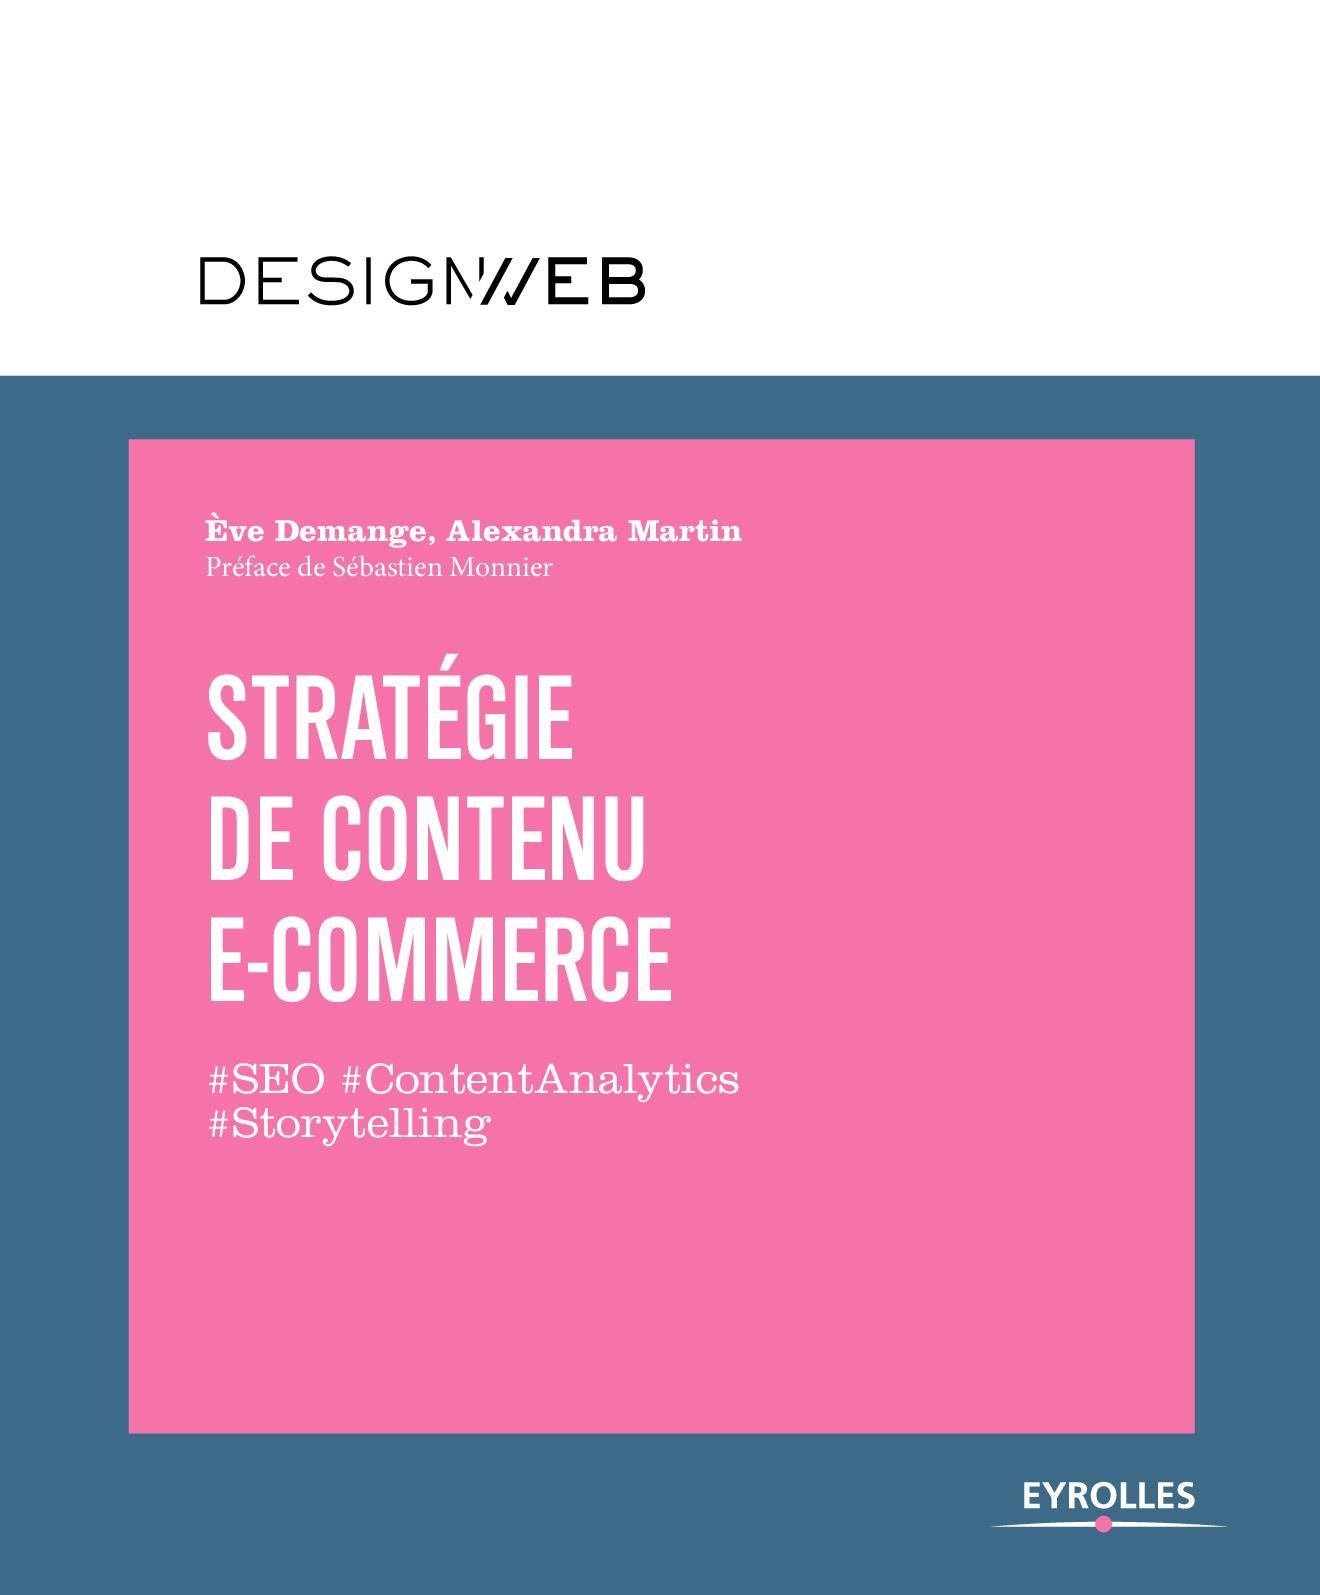 Stratégie de contenu e-commerce - 9782212144048.pdf